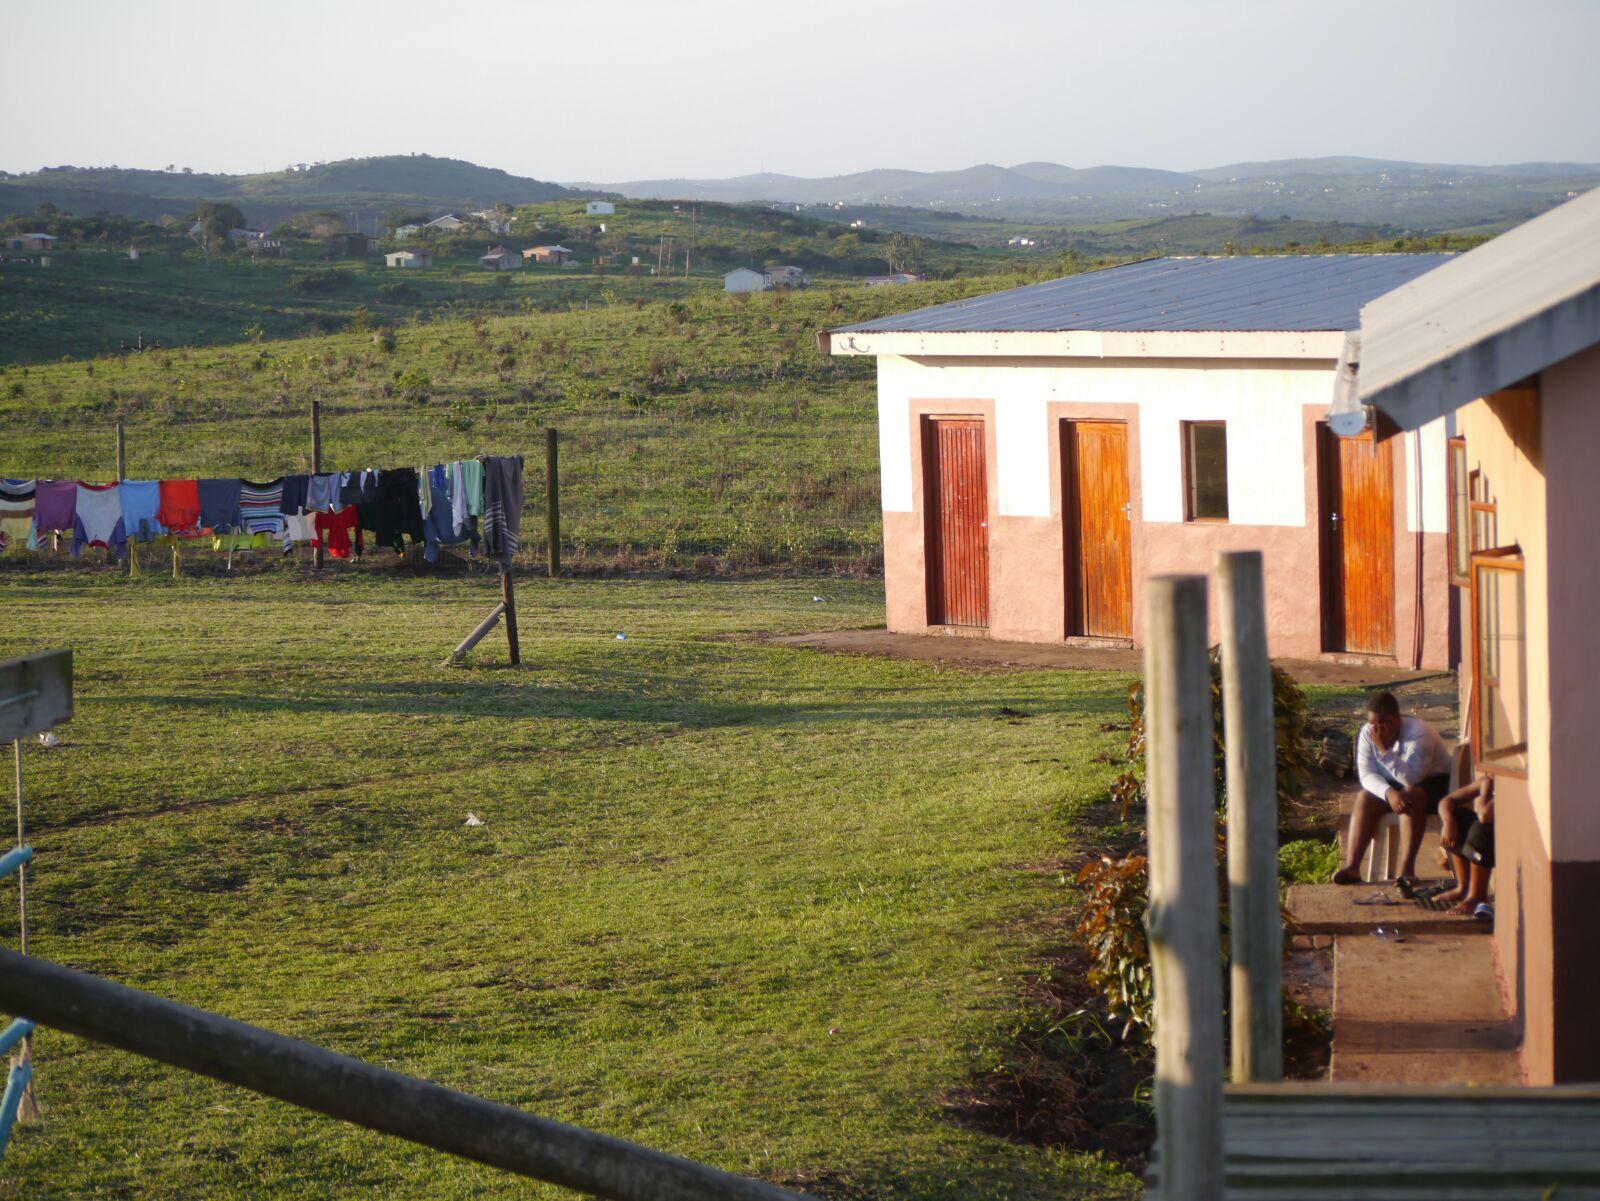 Hilfe im Waisenhaus: Musawe Nkosi, Empangeni